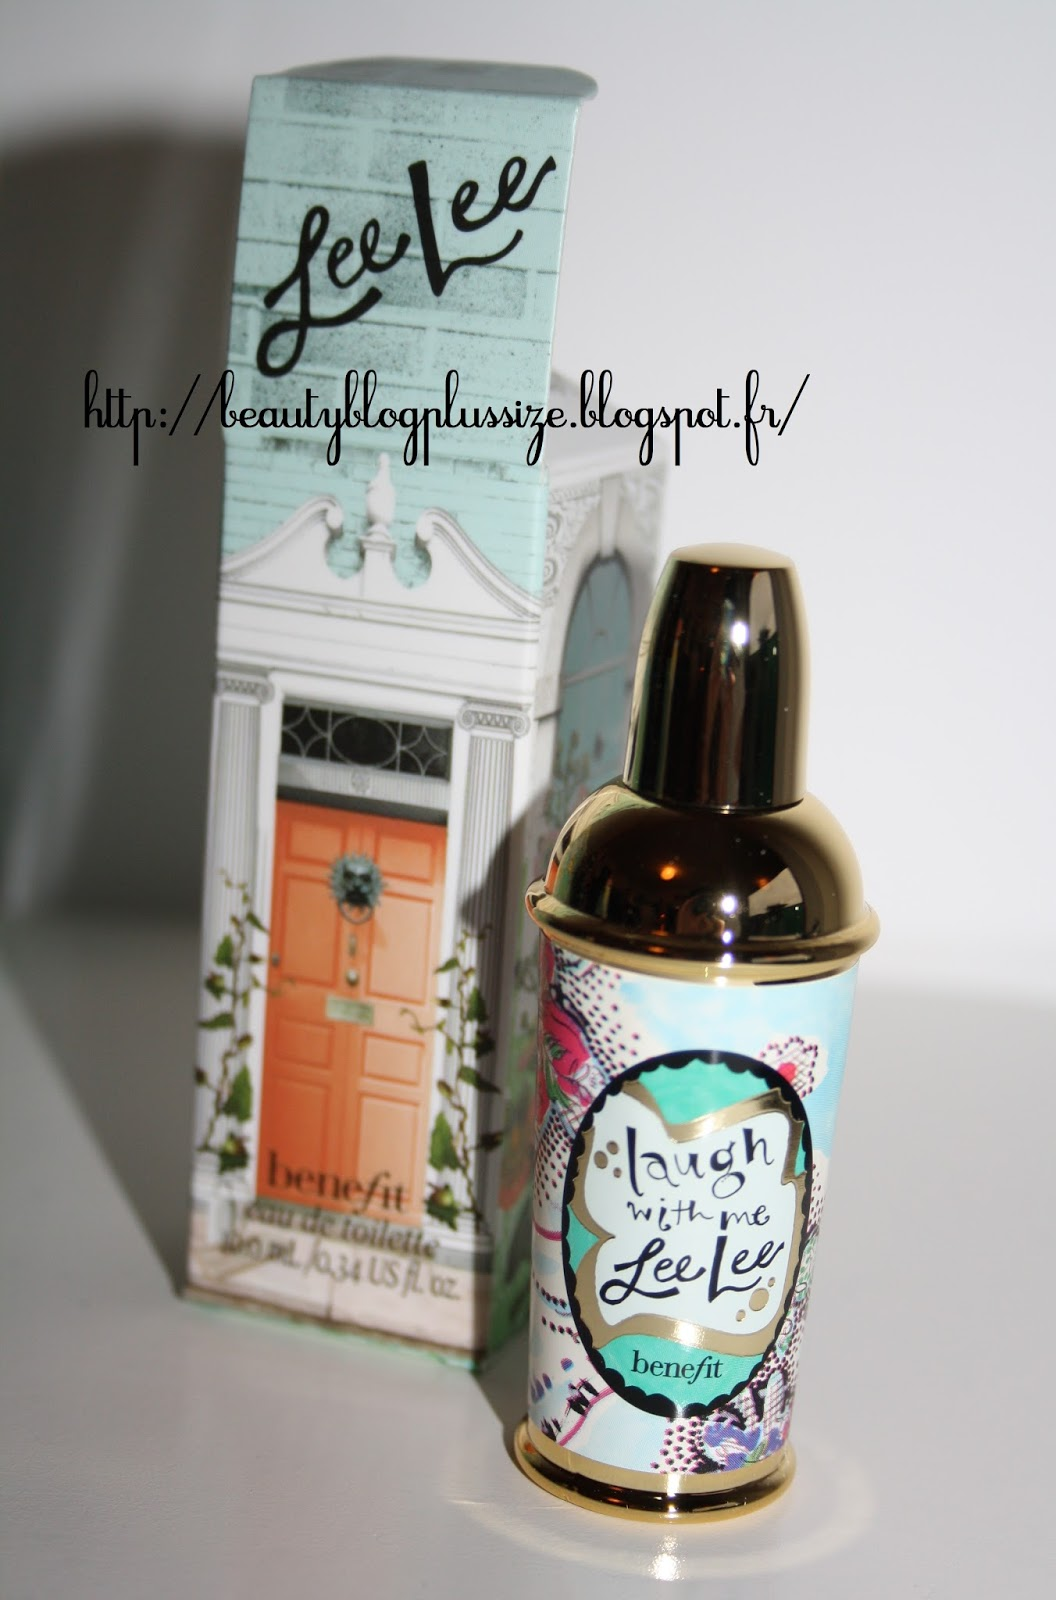 SizeLeelee's Blog BenefitLa Petite Secret Beauty Plus De eWECxQdBro